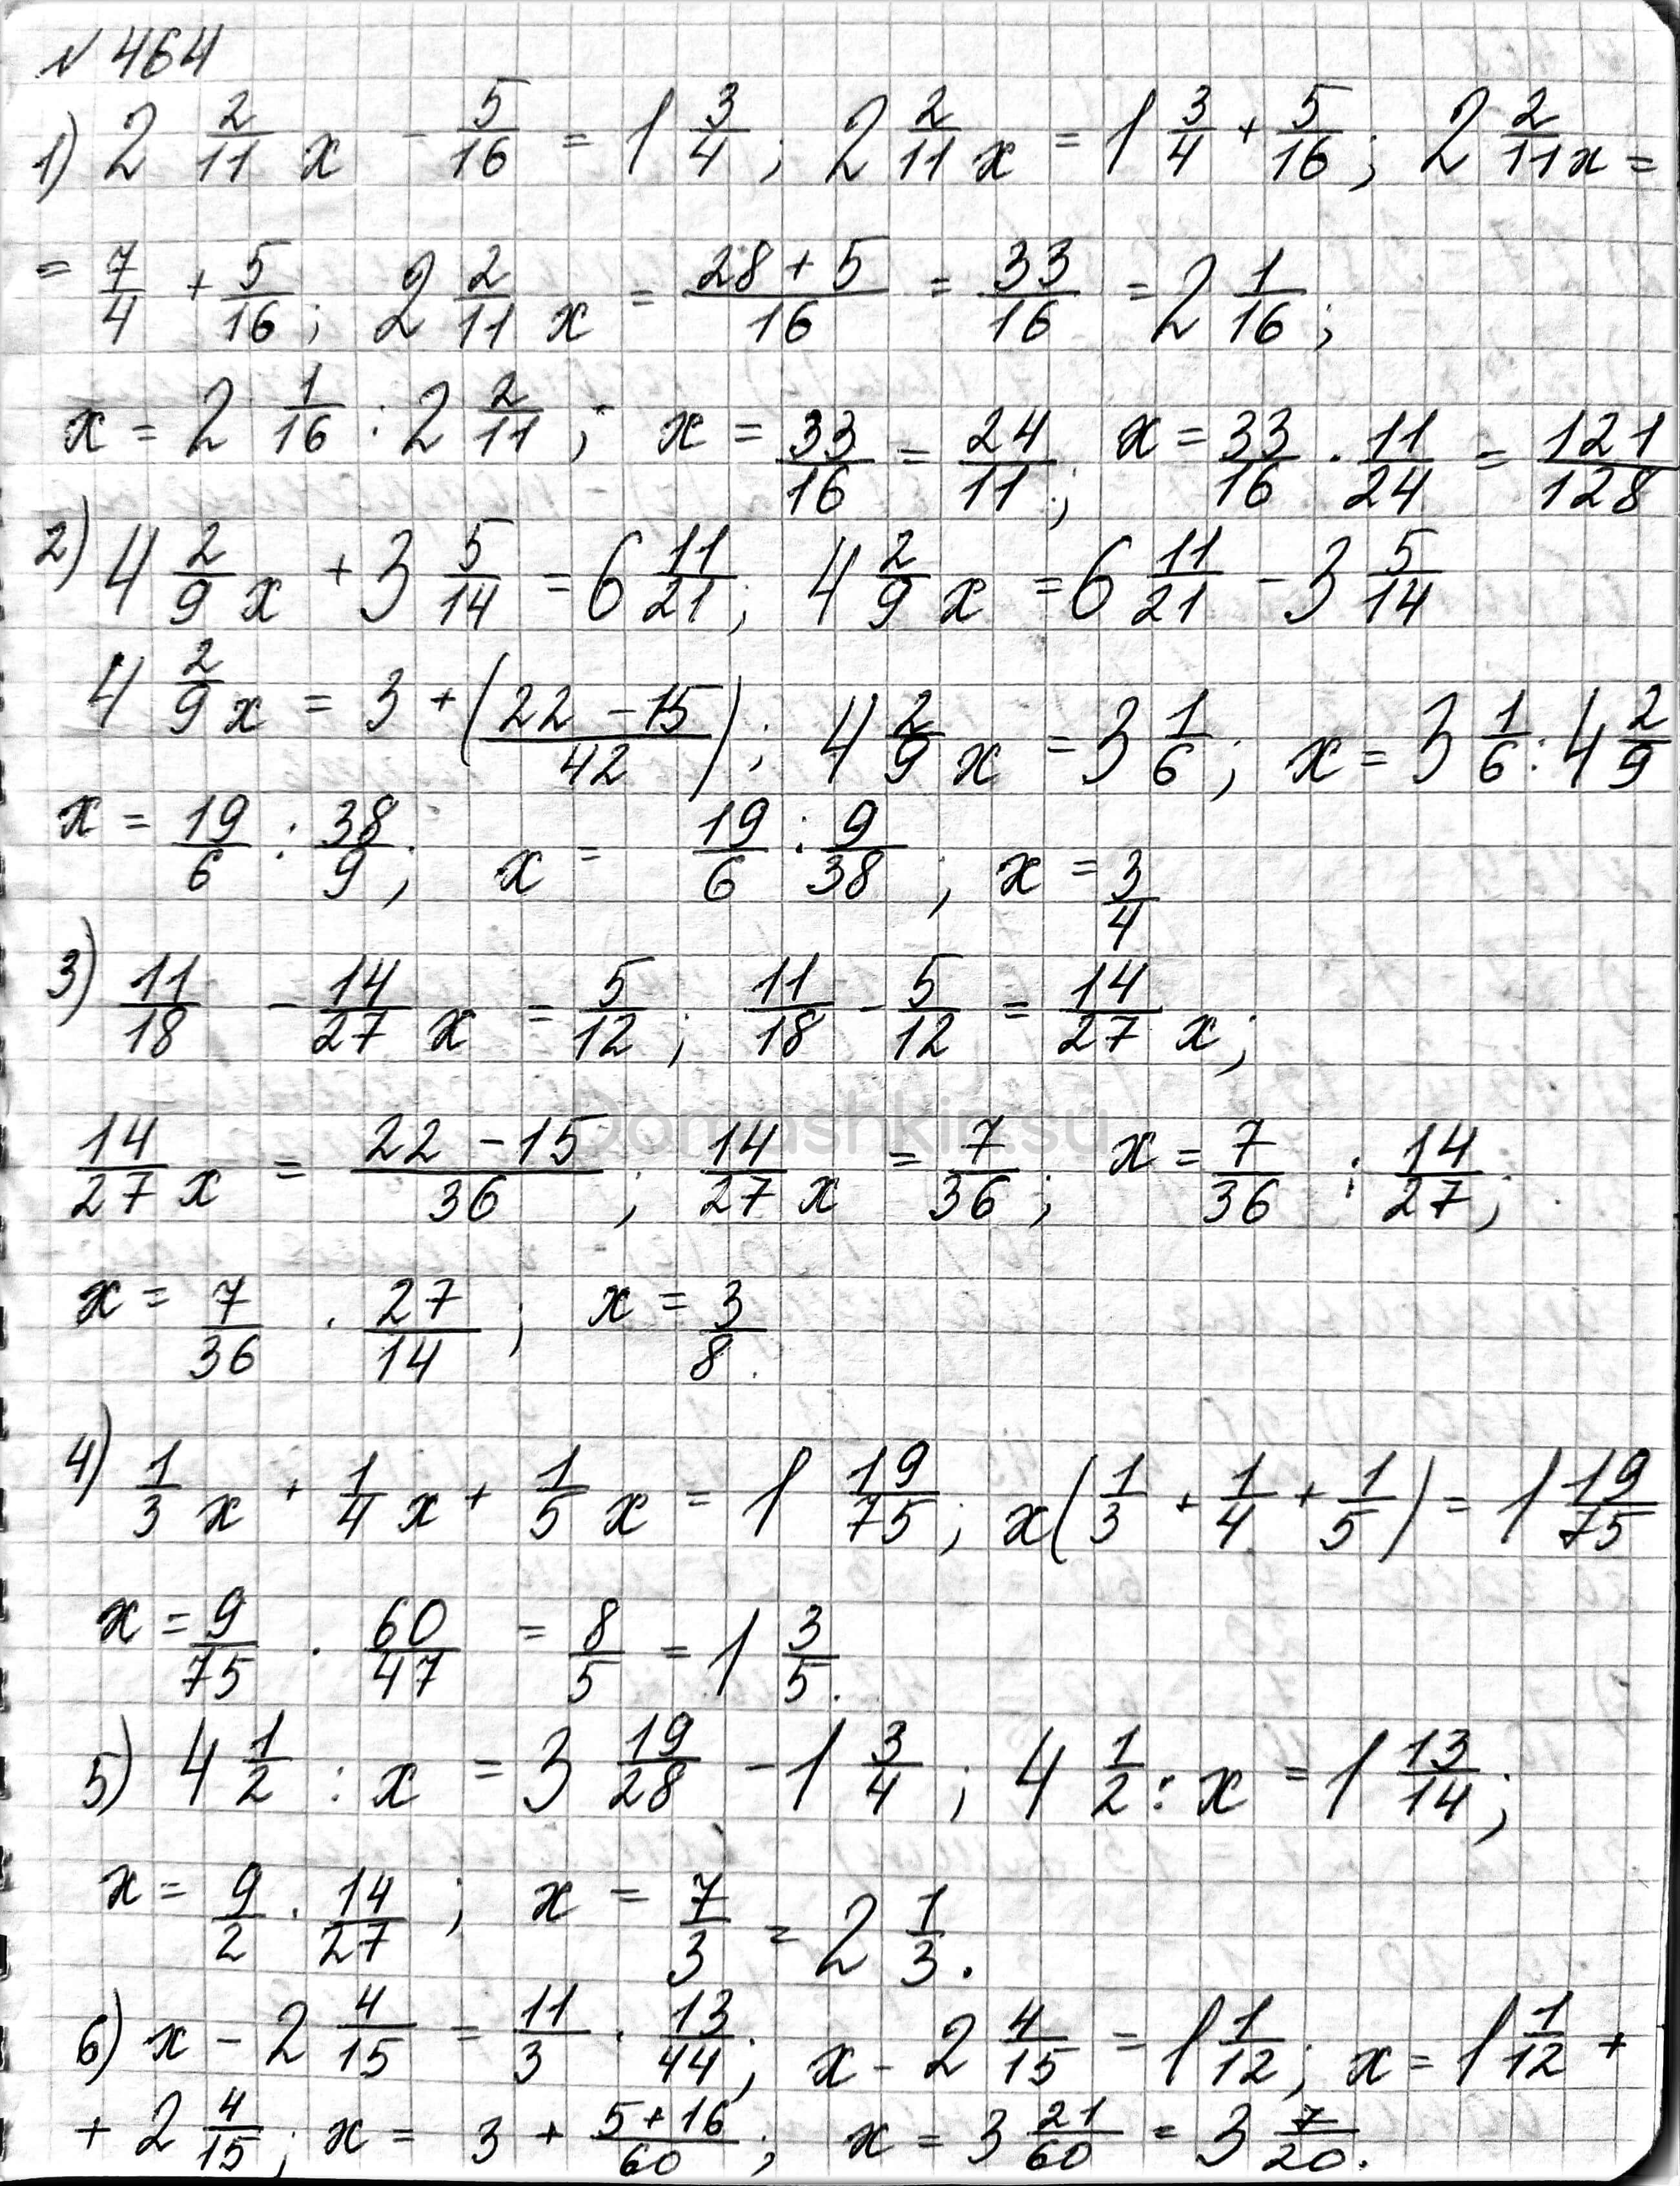 Математика 6 класс учебник Мерзляк номер 464 решение